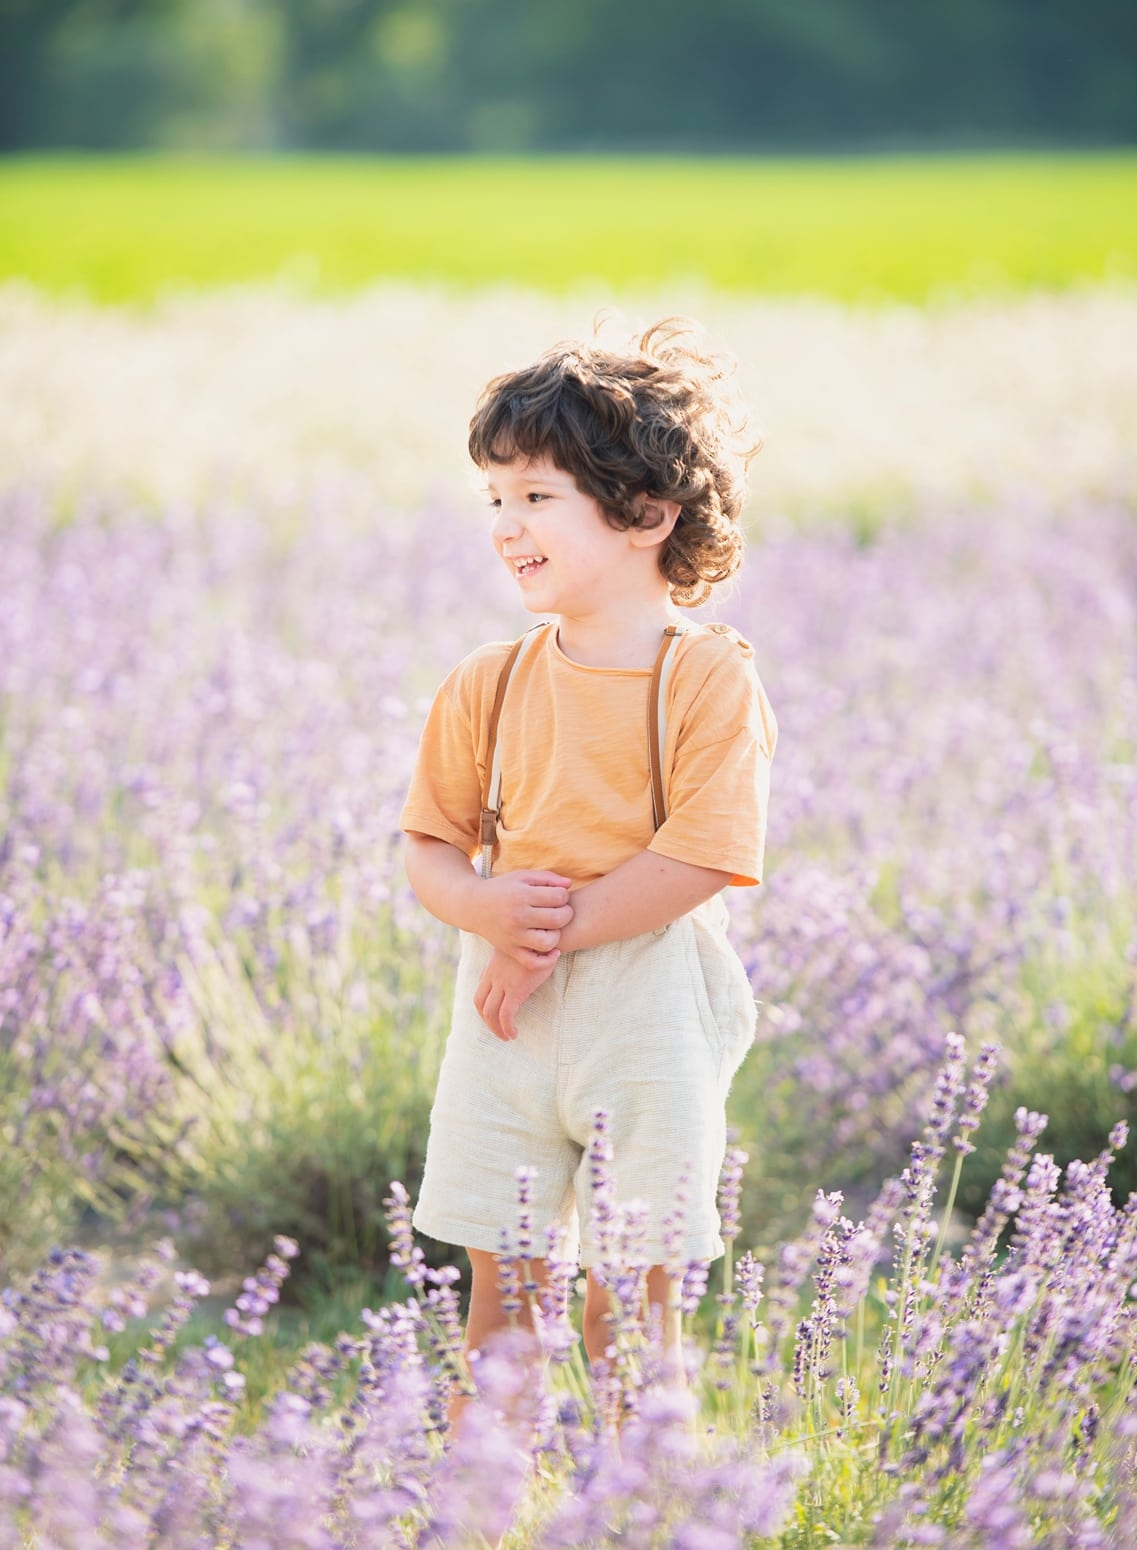 Pictonat_Lavender_0727_0168_WEB